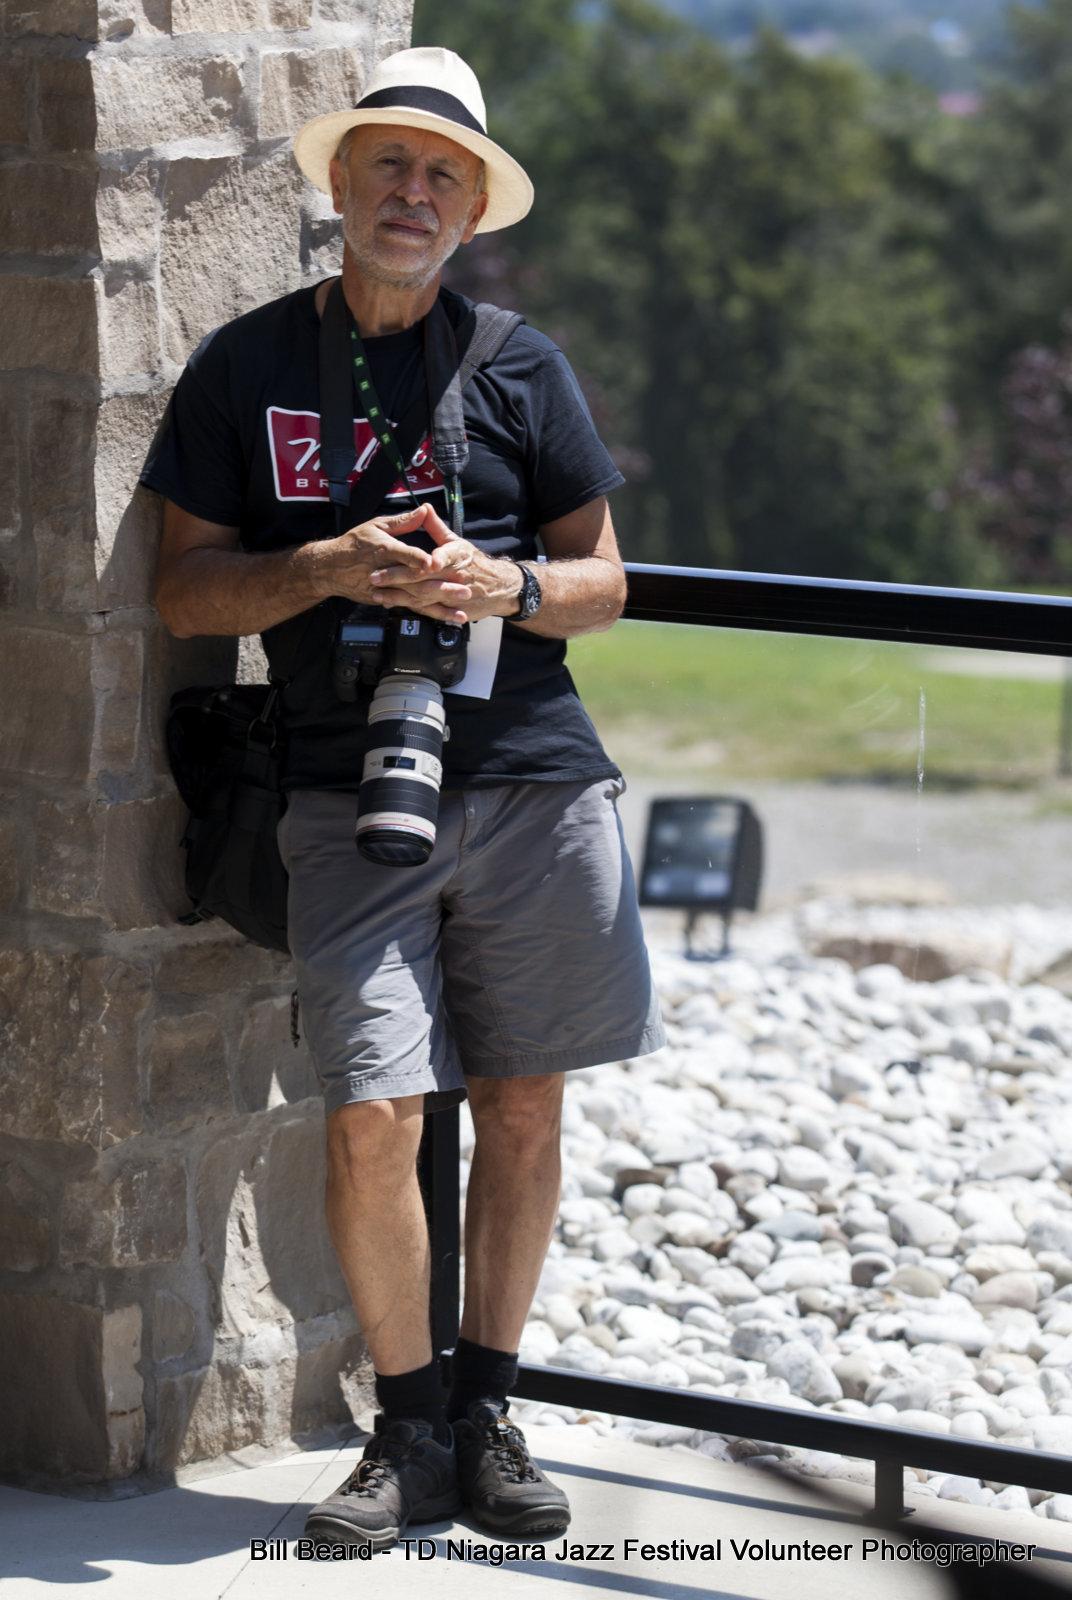 JAZZ on the RISE - Canada 150 Cosmo Condina (Volunteer photographer) Sunday, July 30th, 2017. Photo: Bill Beard